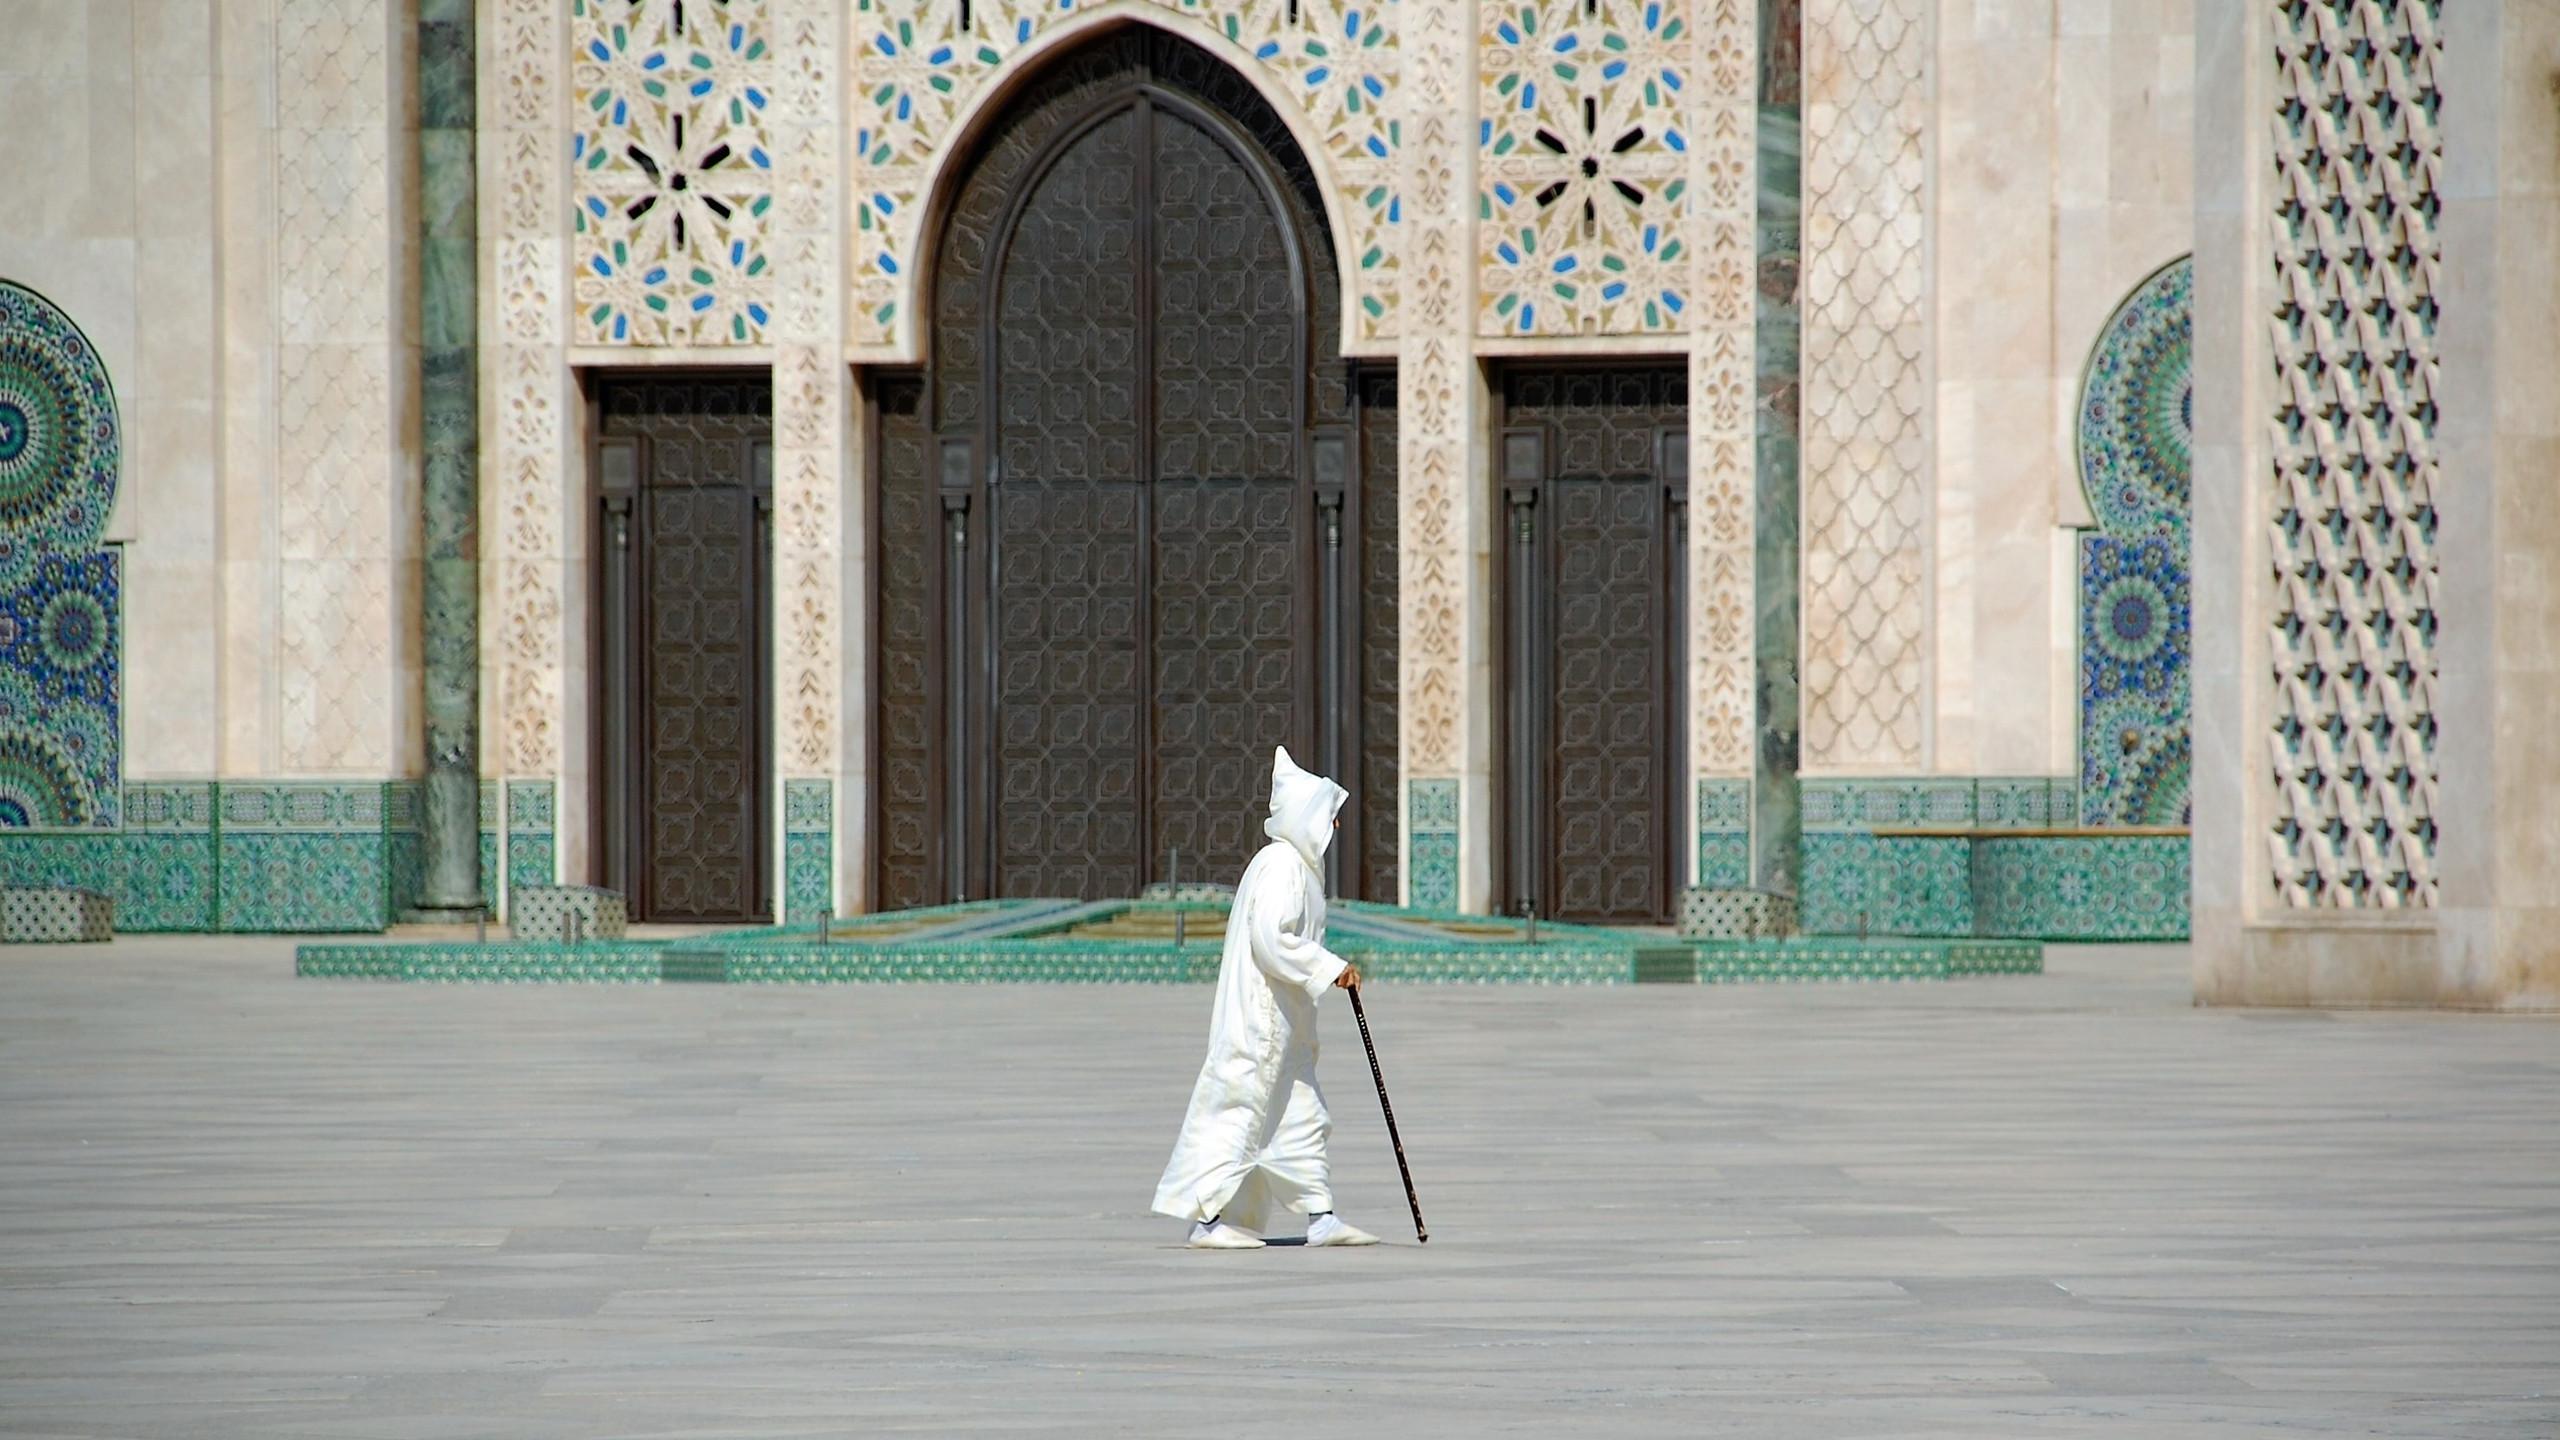 morocco-165761